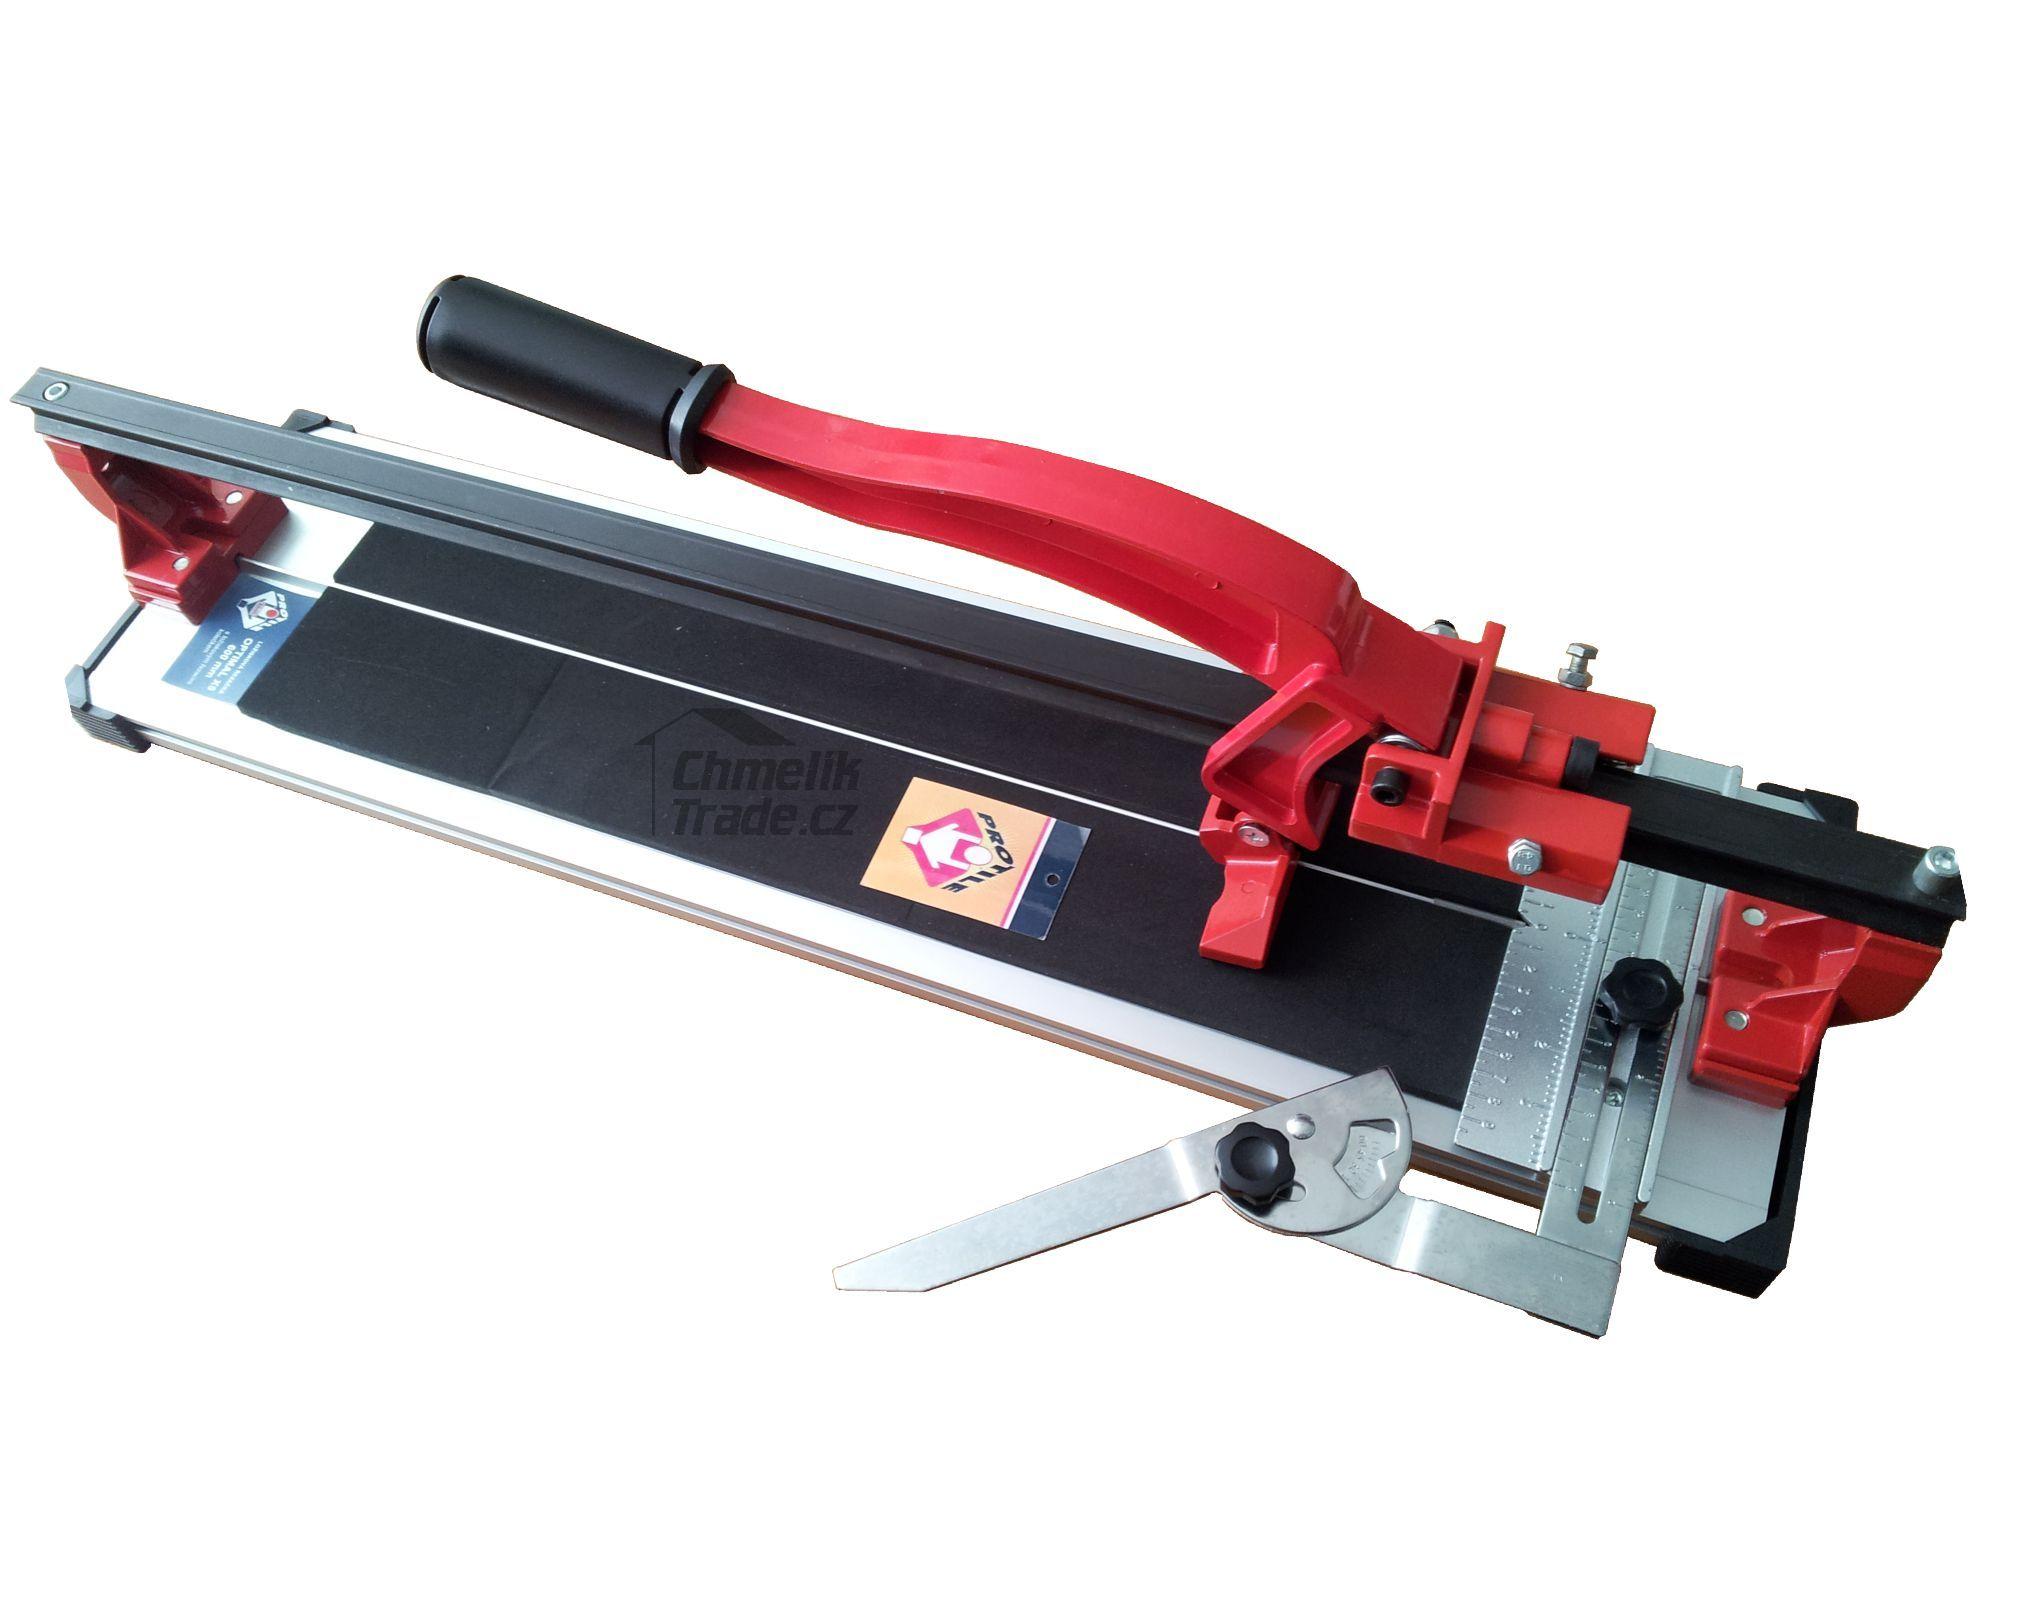 Řezačka na obklady Optimal X5 - 500 mm